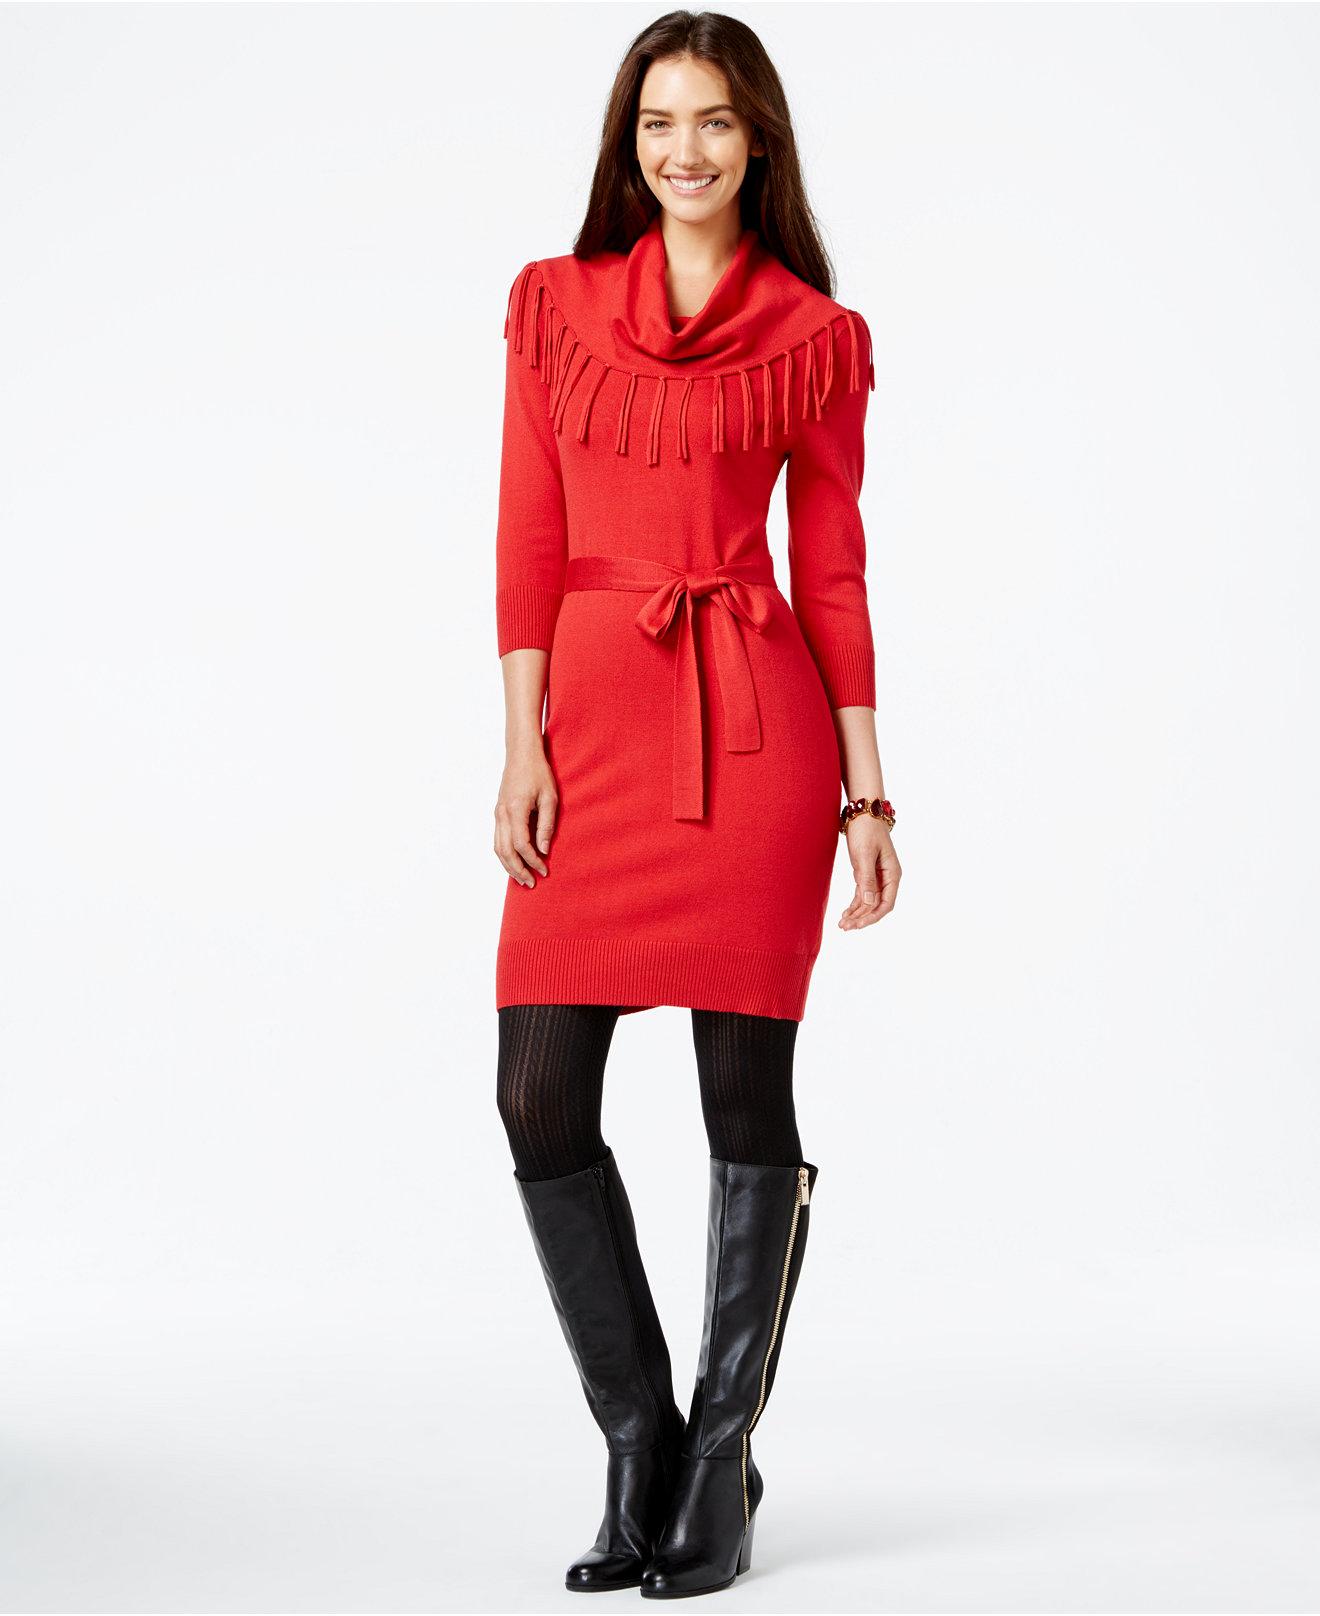 SWEATER DRESS - Tamunsa Delen